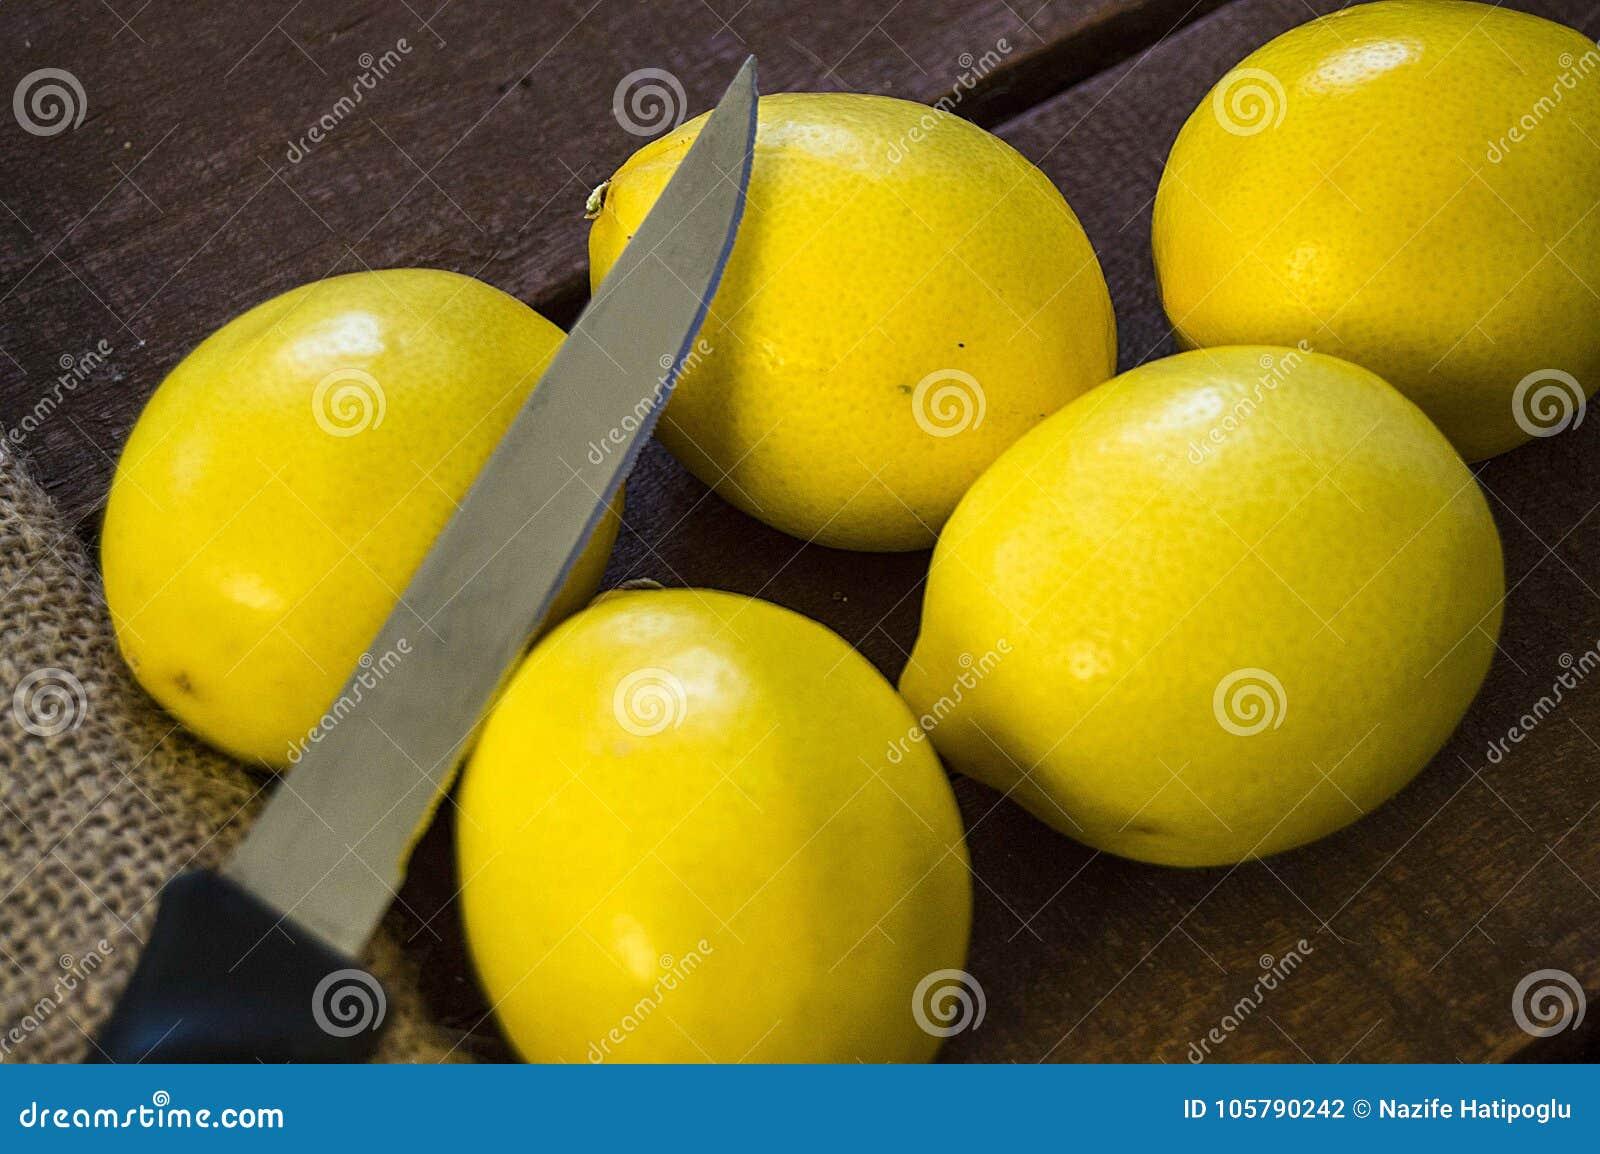 PPhotos Of Lemon With Knife On Wooden Floors, Hand-cut ...